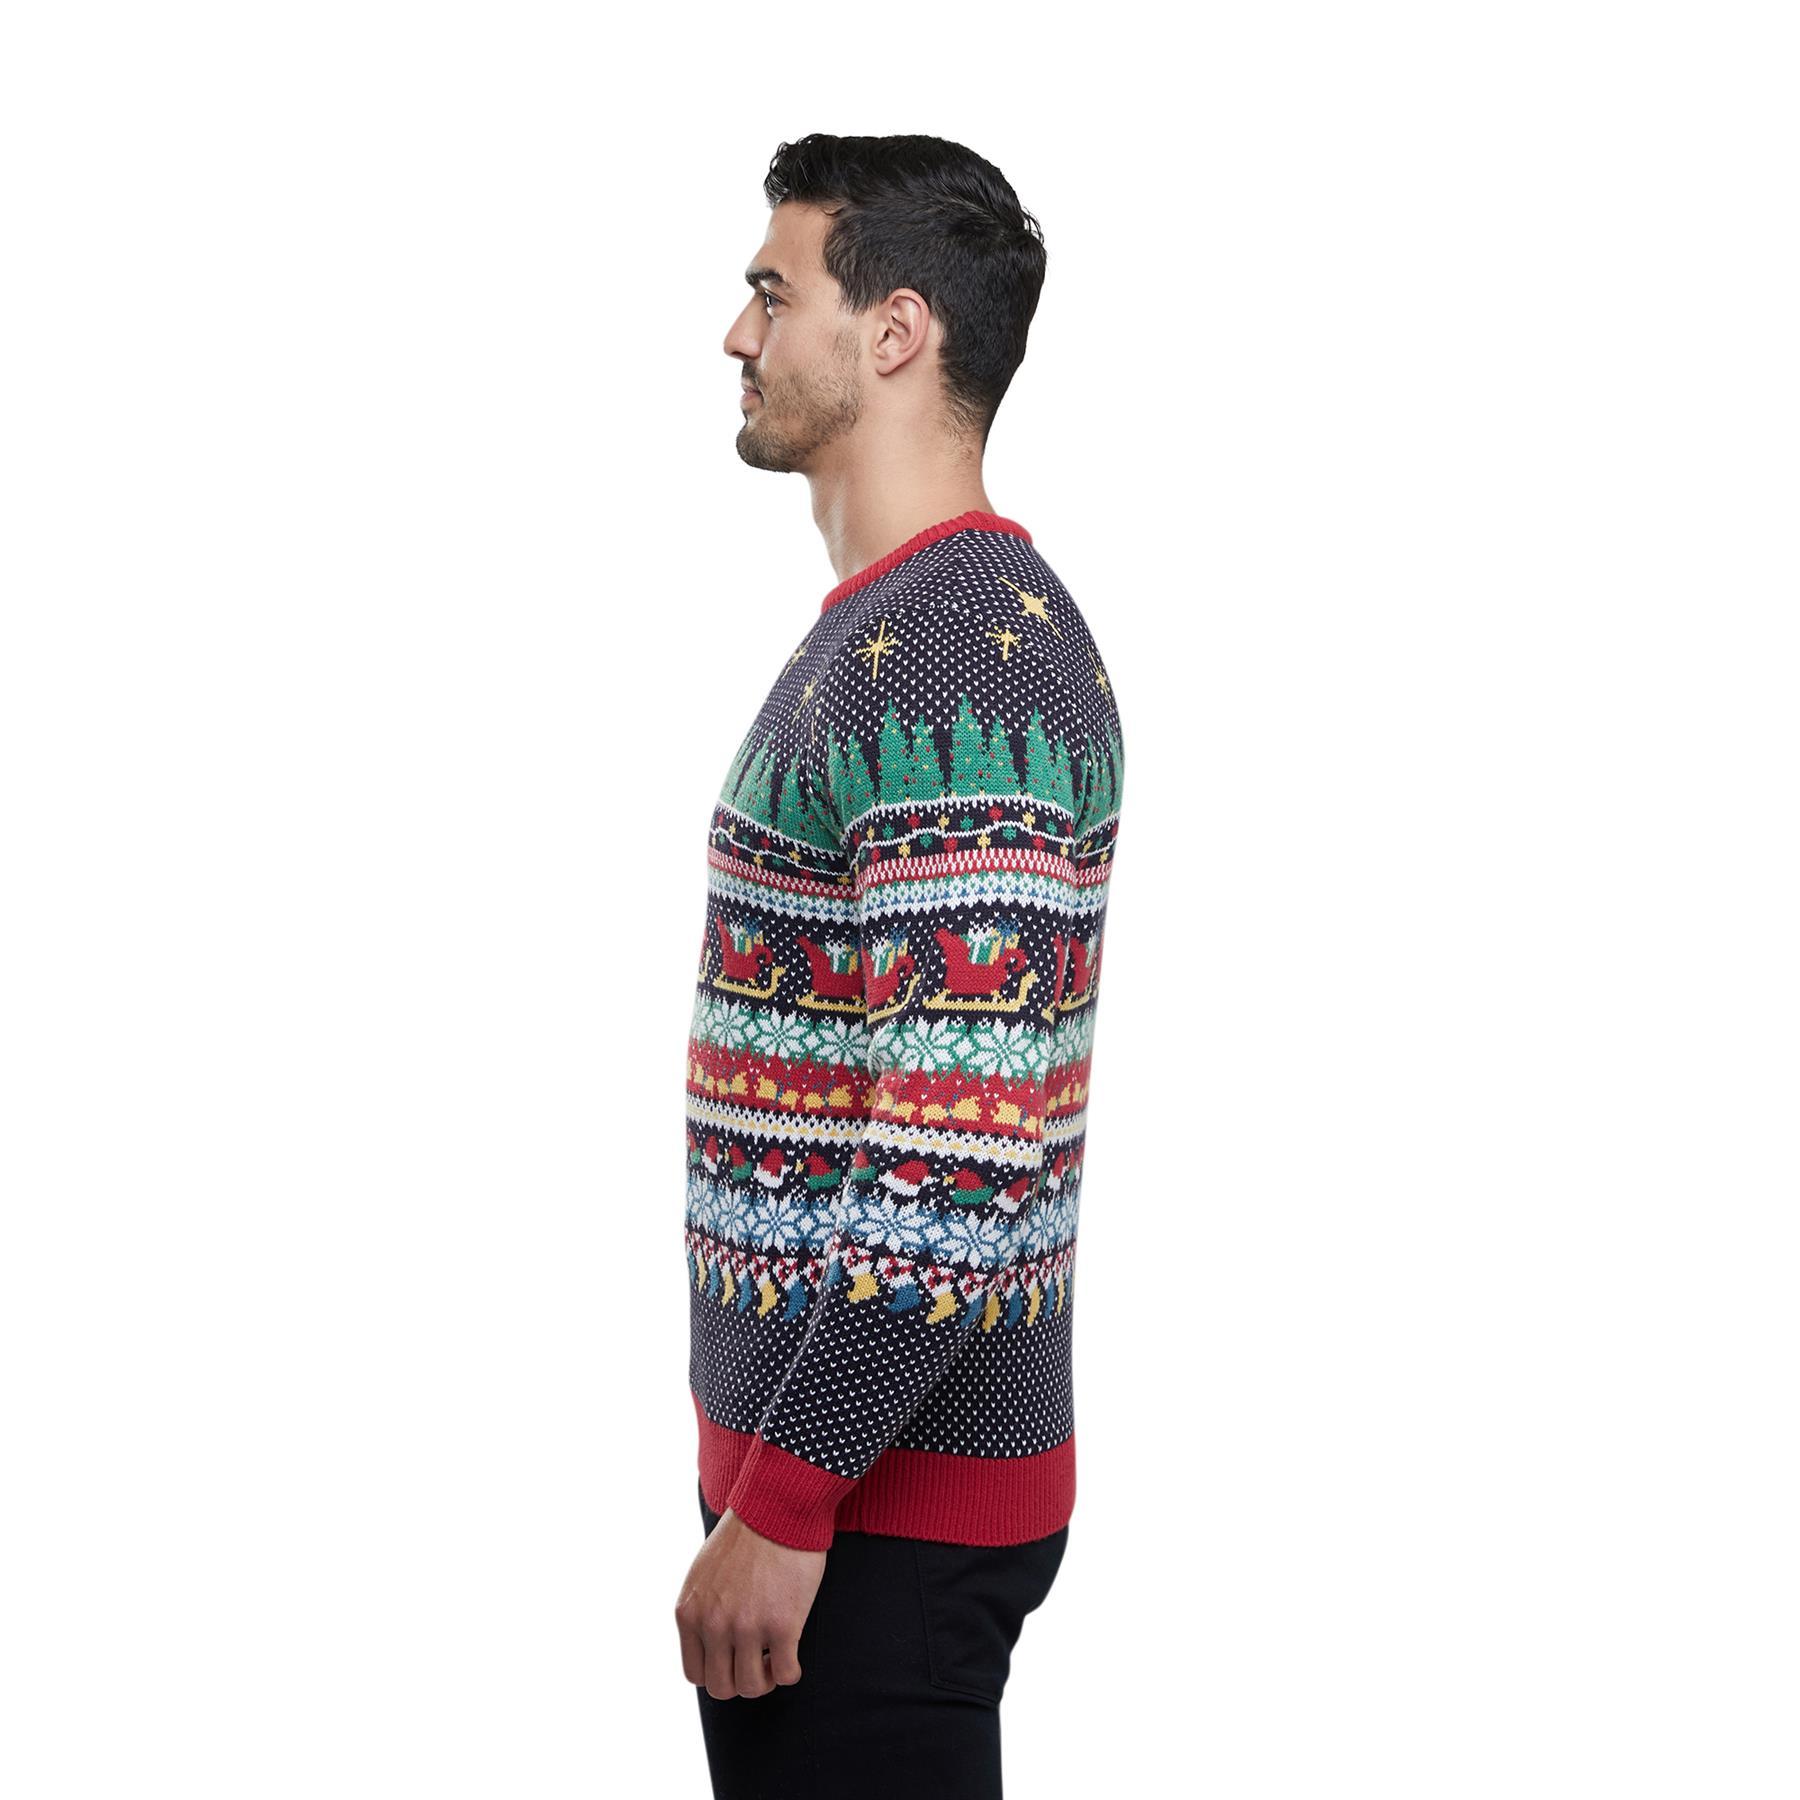 Homme arbre de Noël Renne Motif Fair Isle Novelty Christmas Jumper Sweater